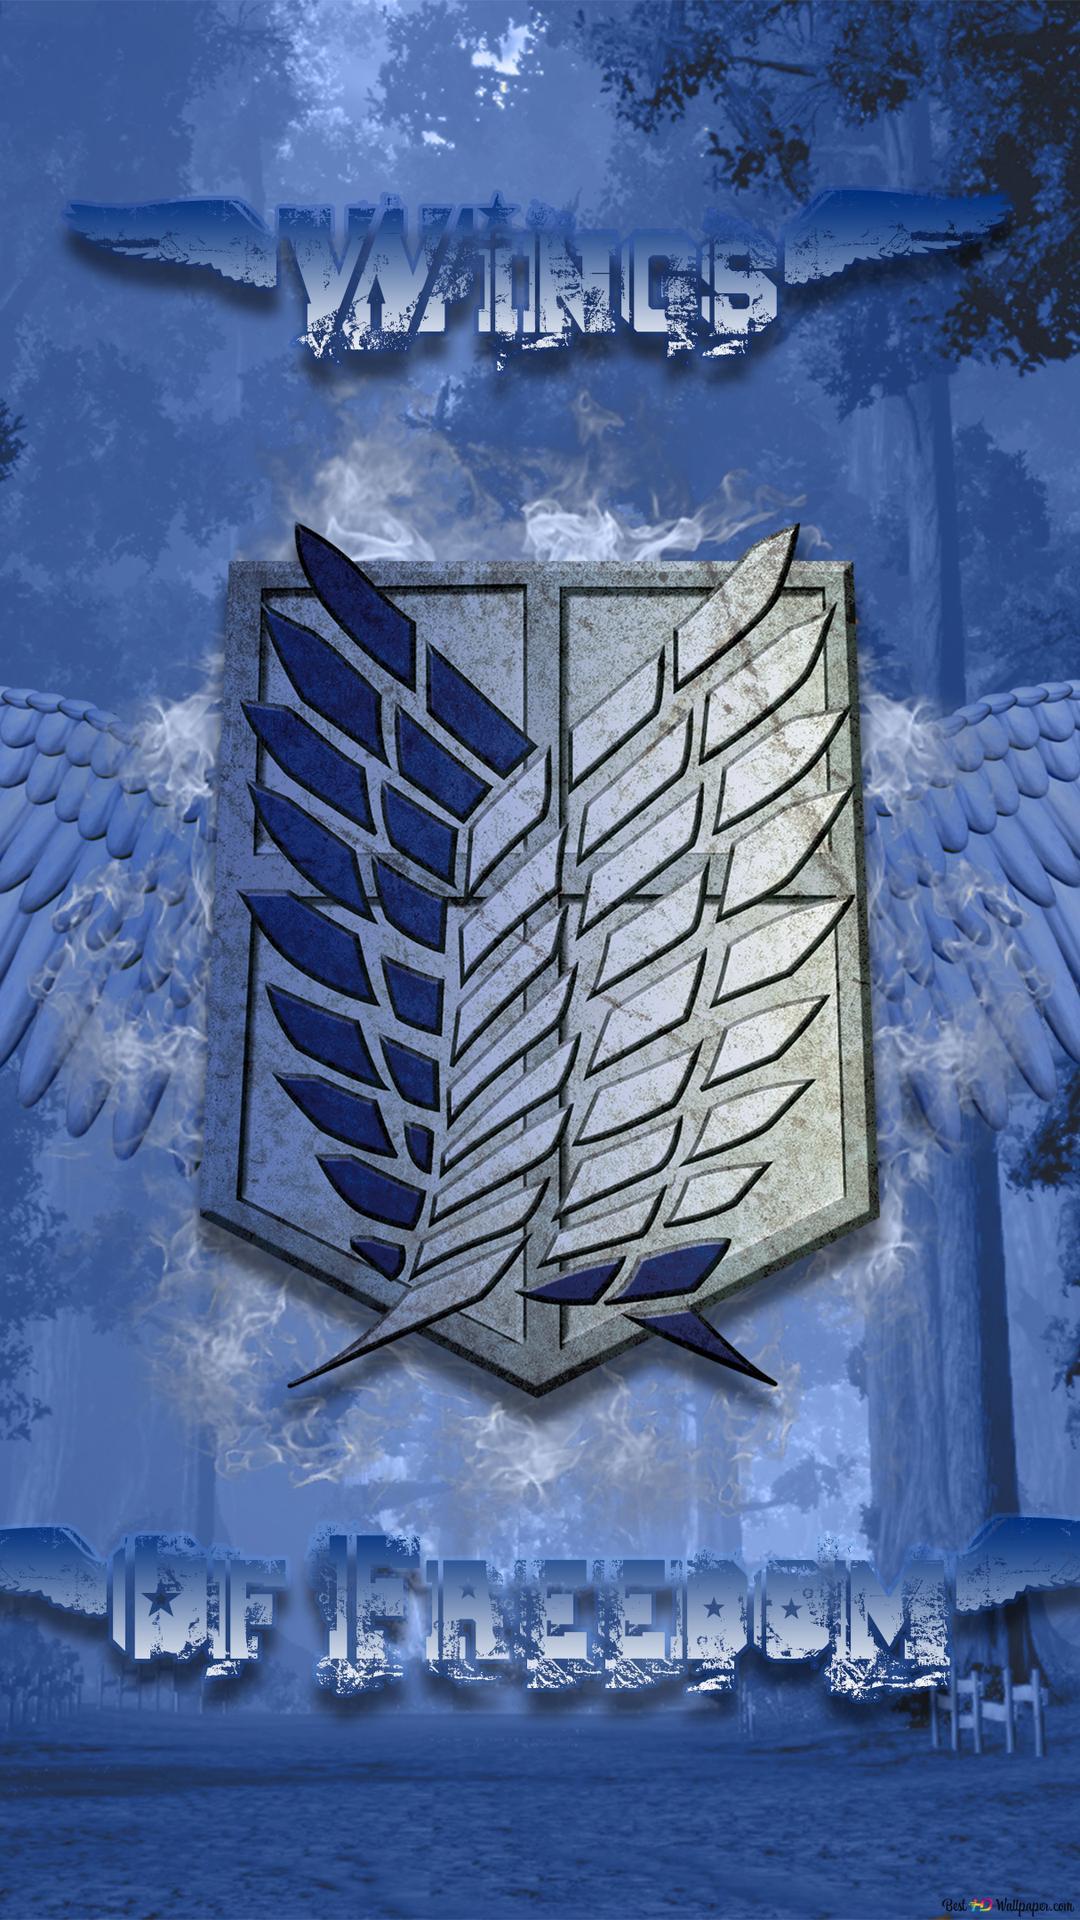 Scouting Legion Hd Wallpaper Download